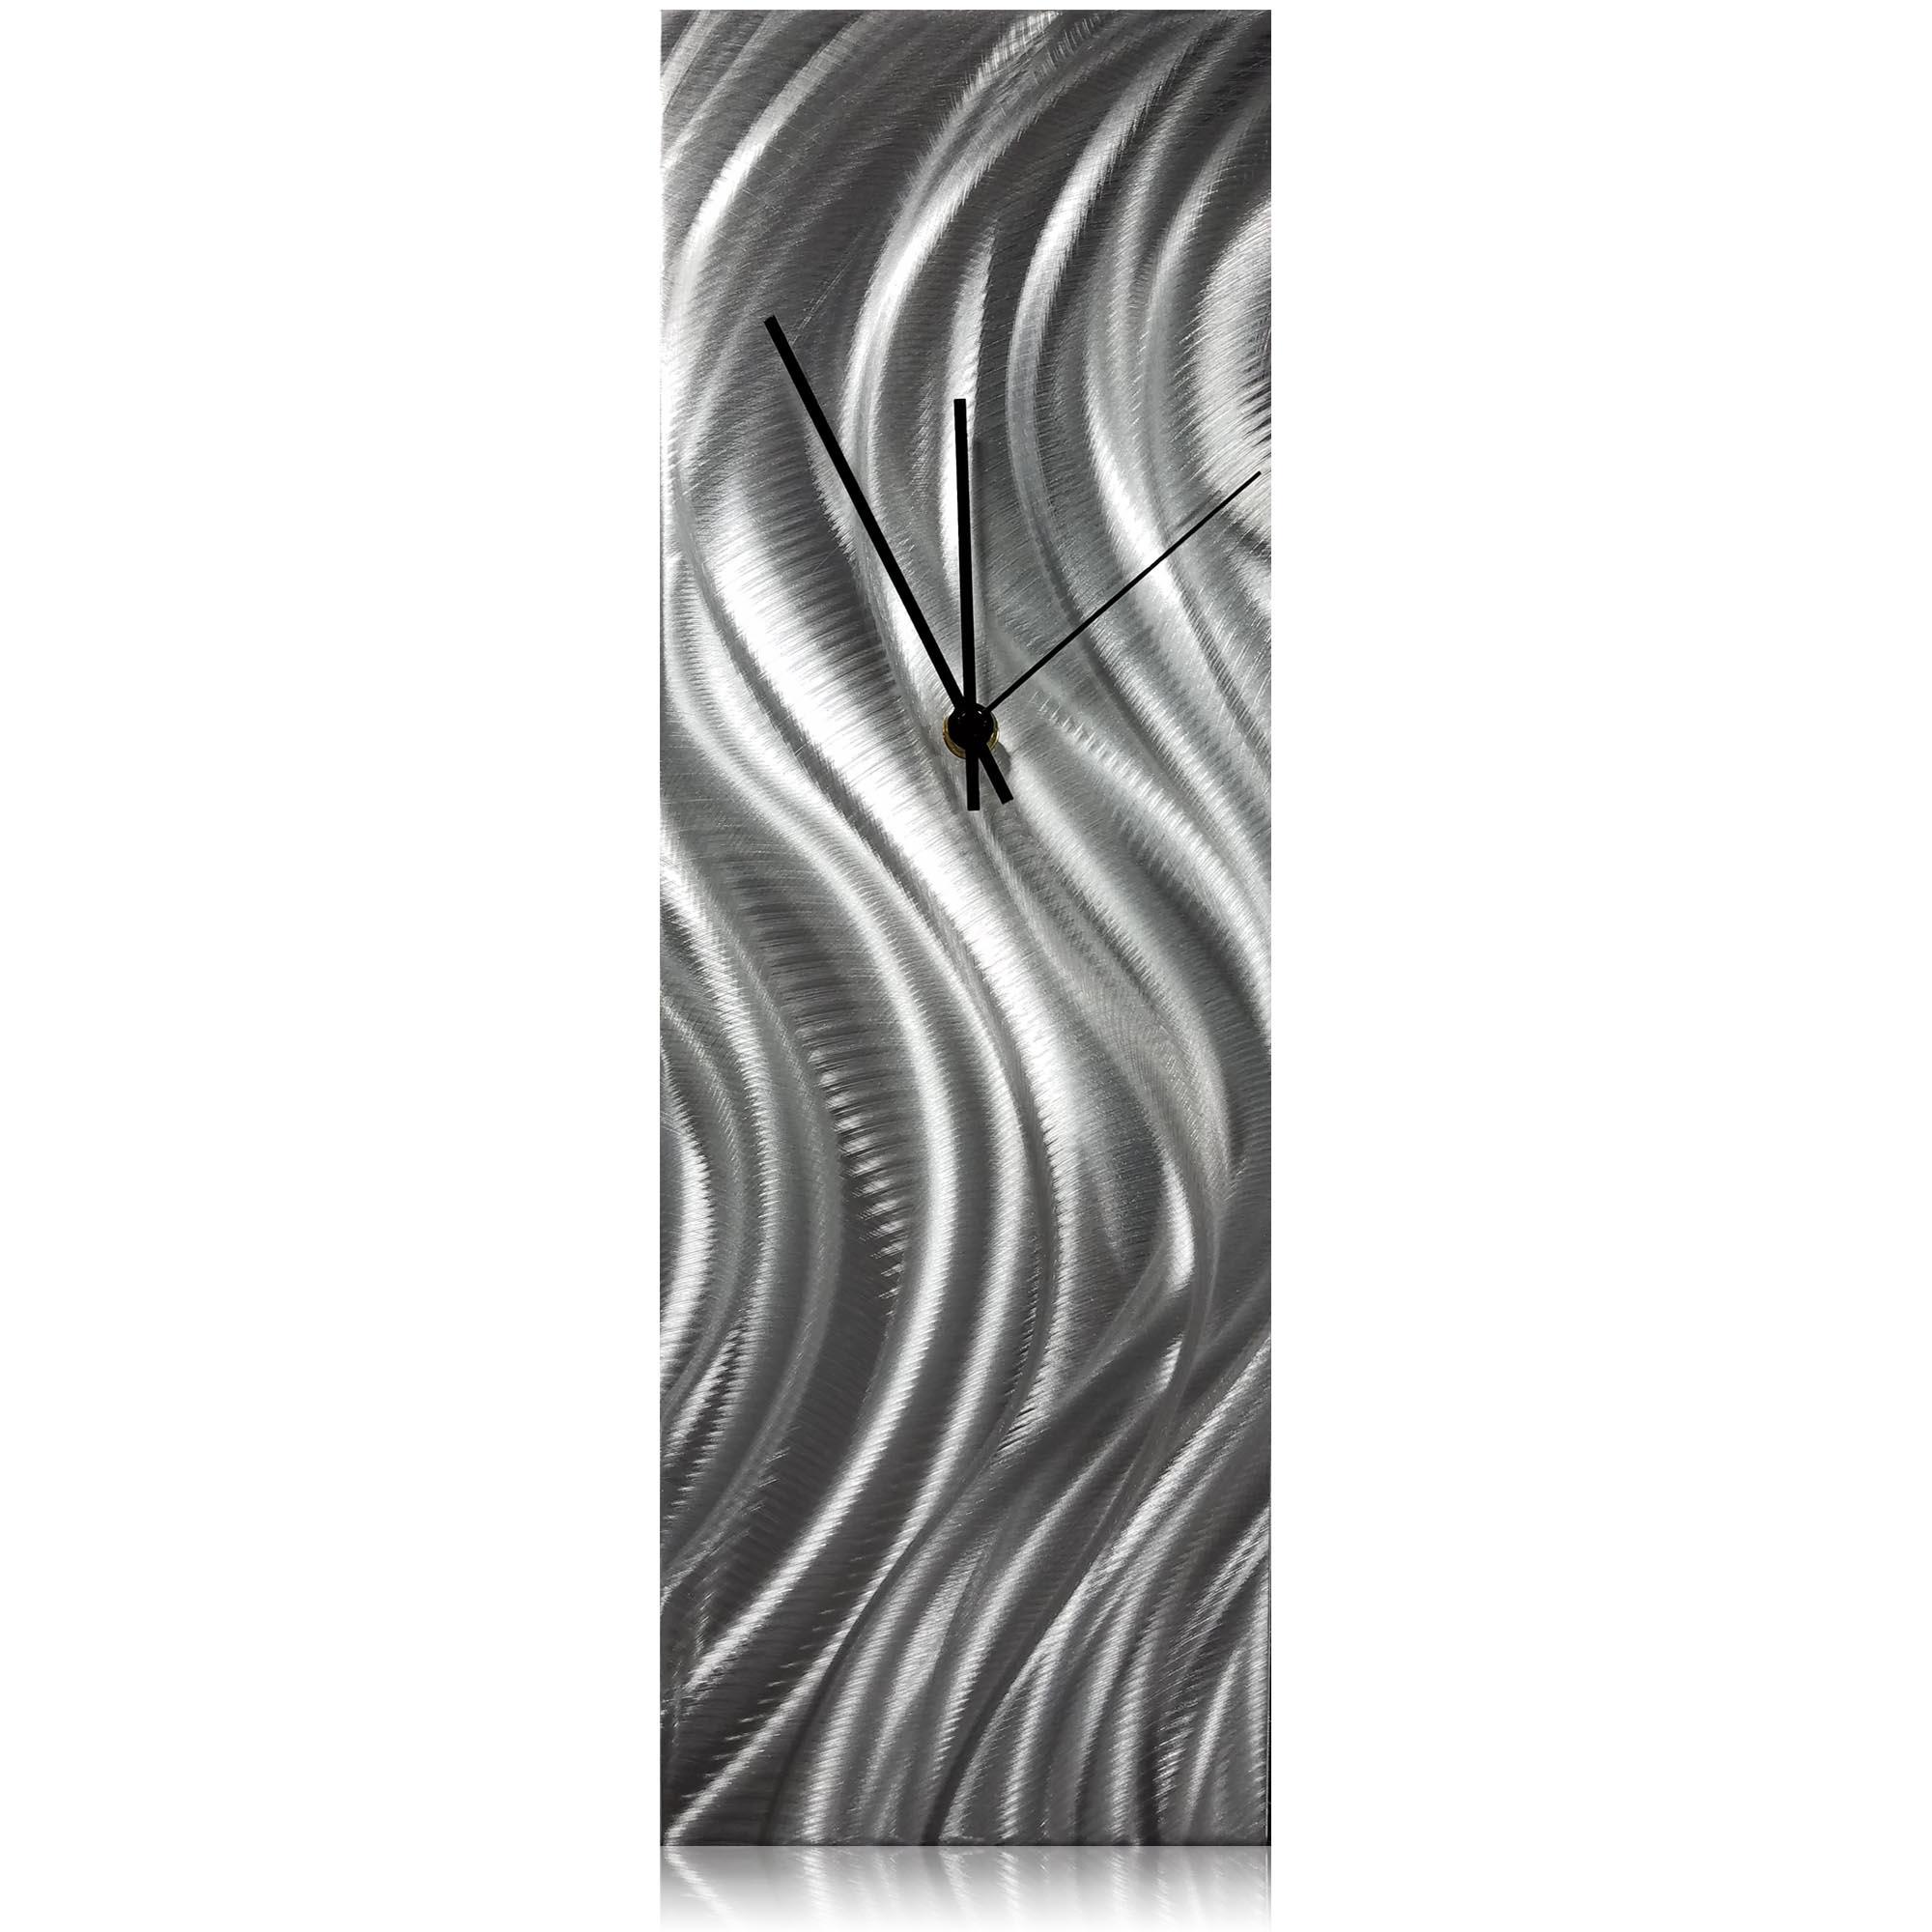 Silver River Desk Clock 6x18in. Natural Aluminum